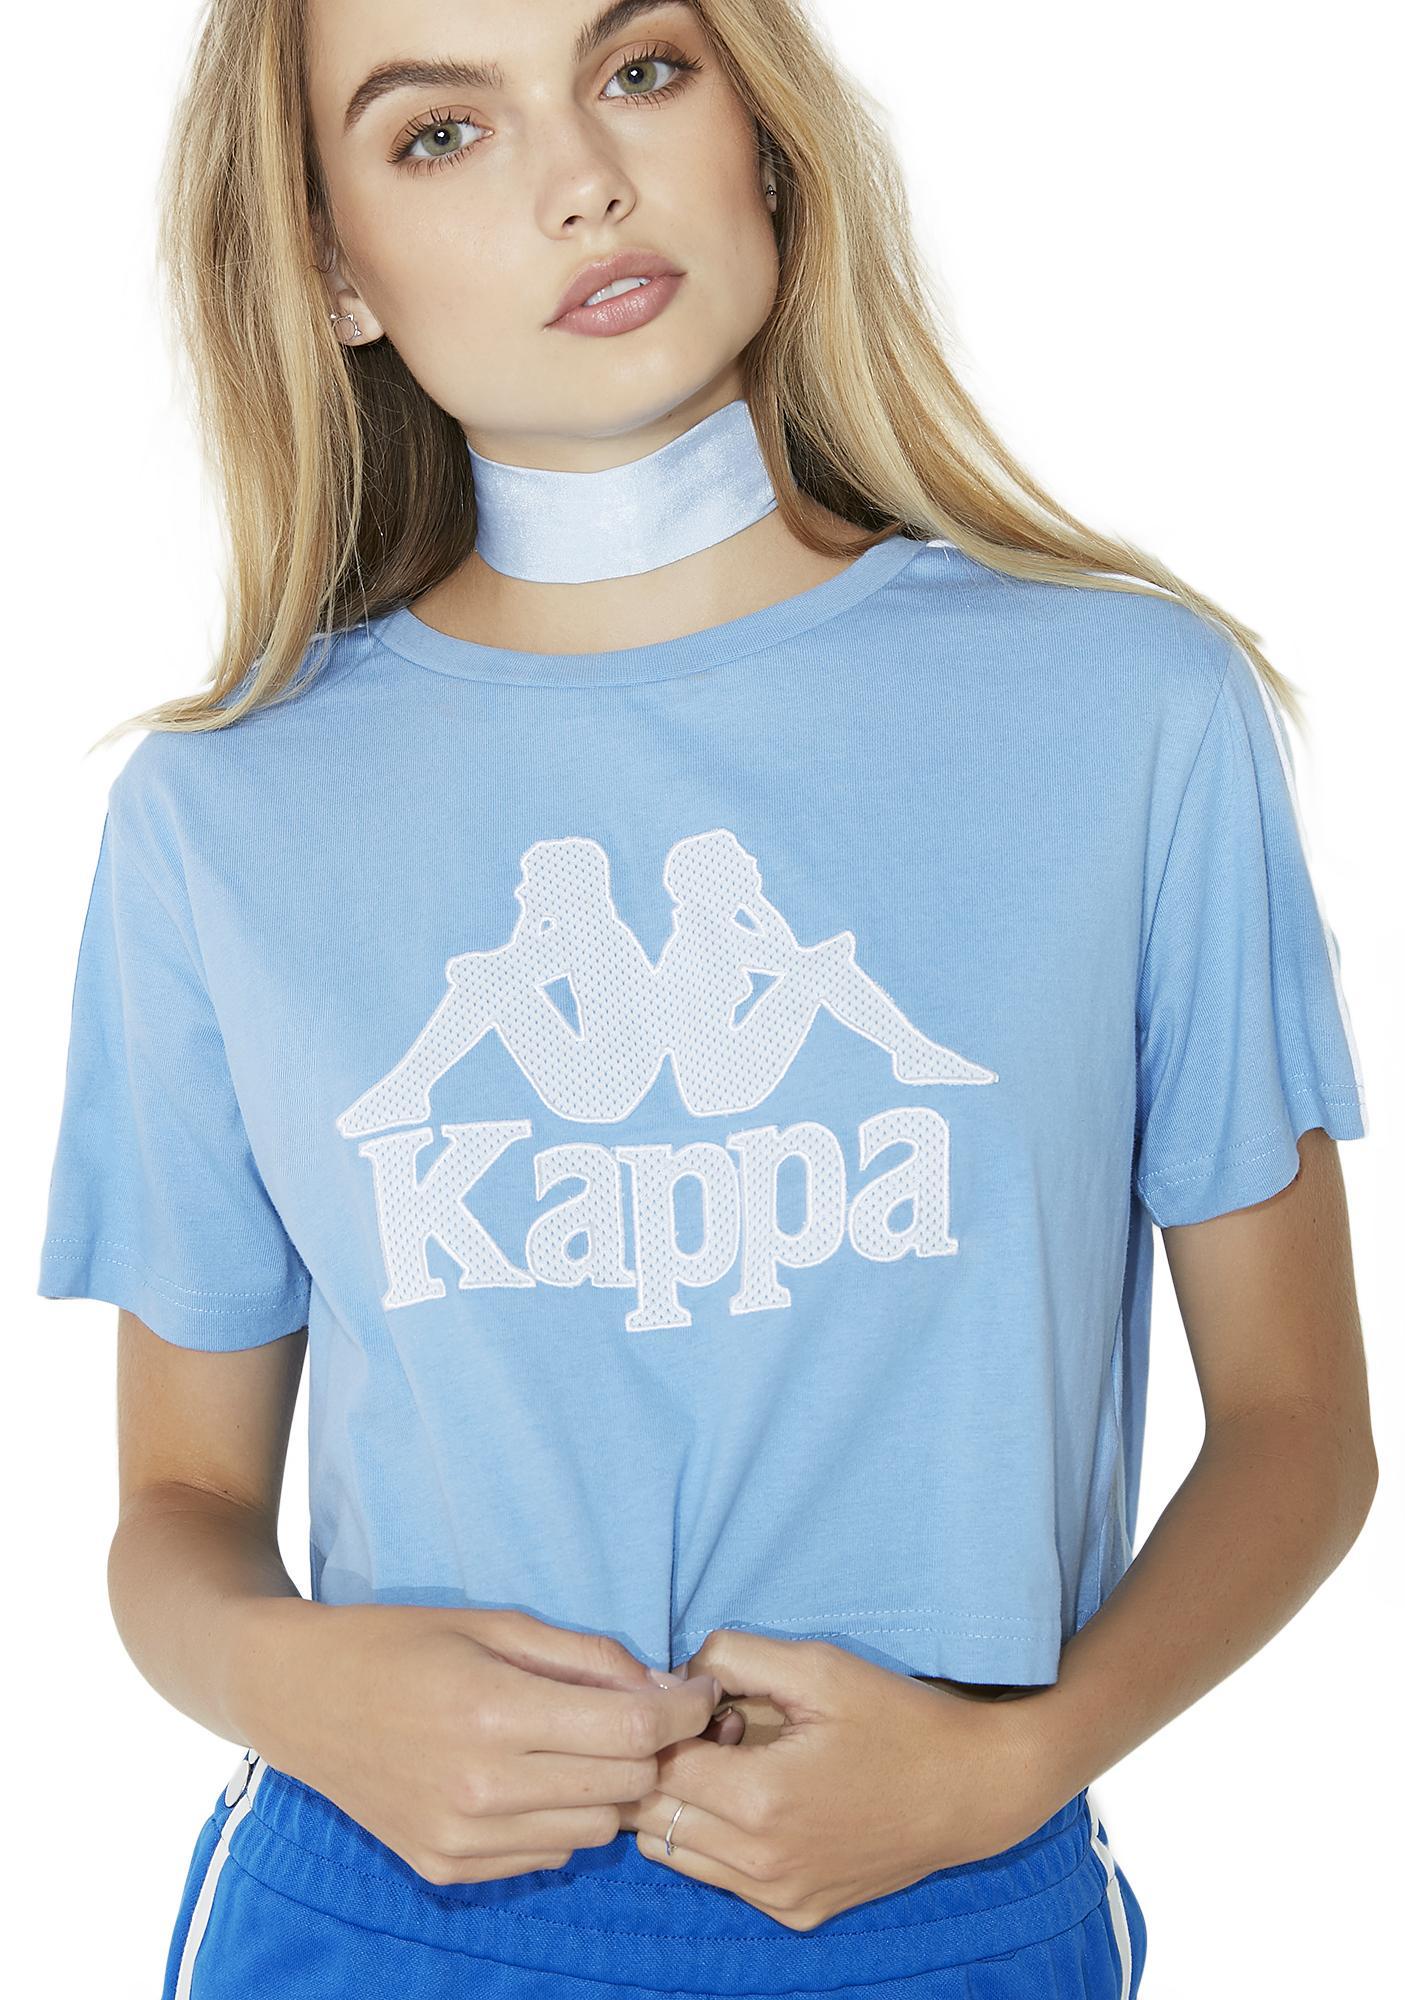 Kappa Kappa Cropped Tee